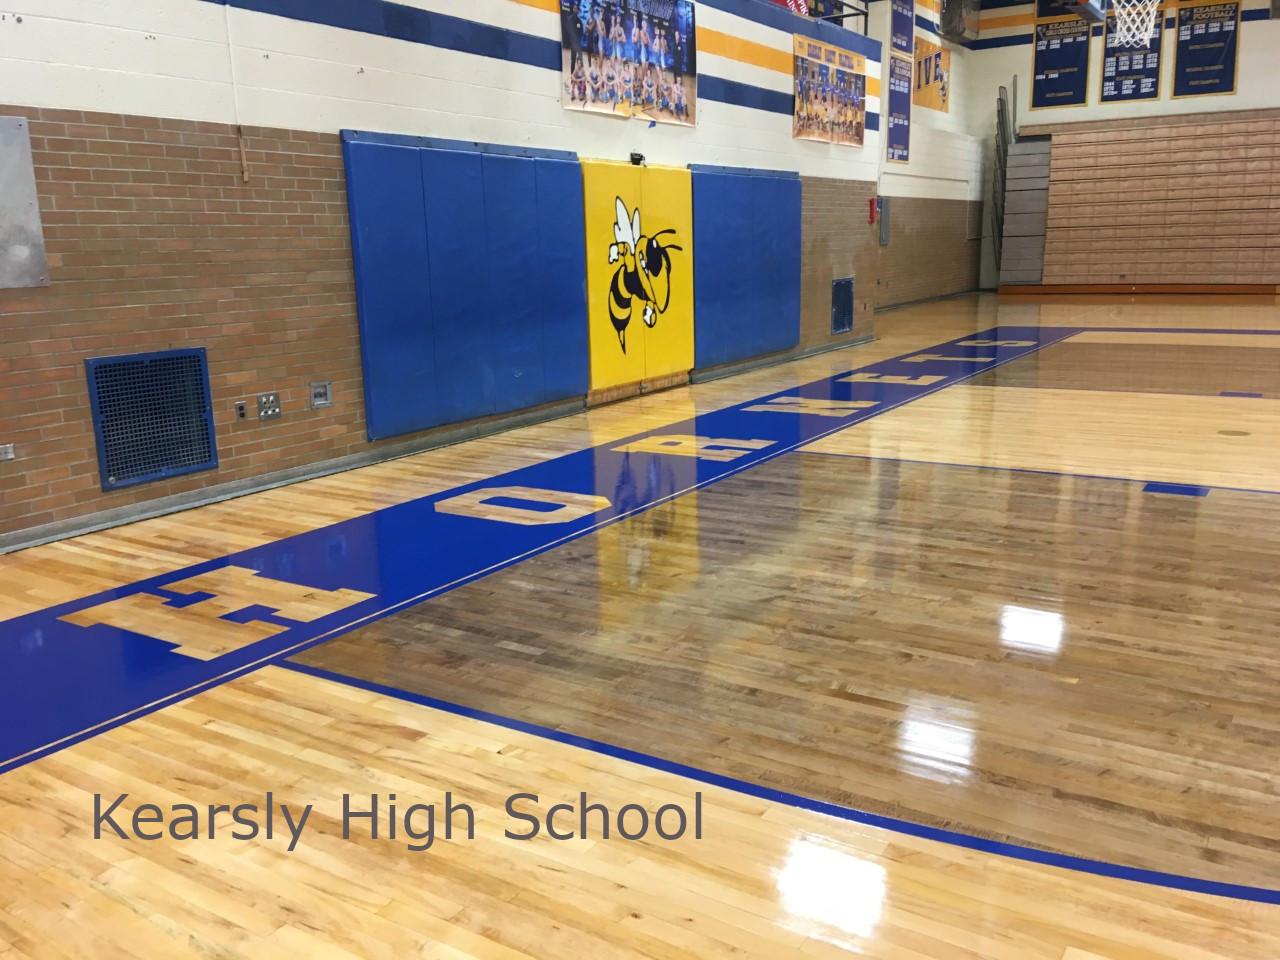 Kearsly High School